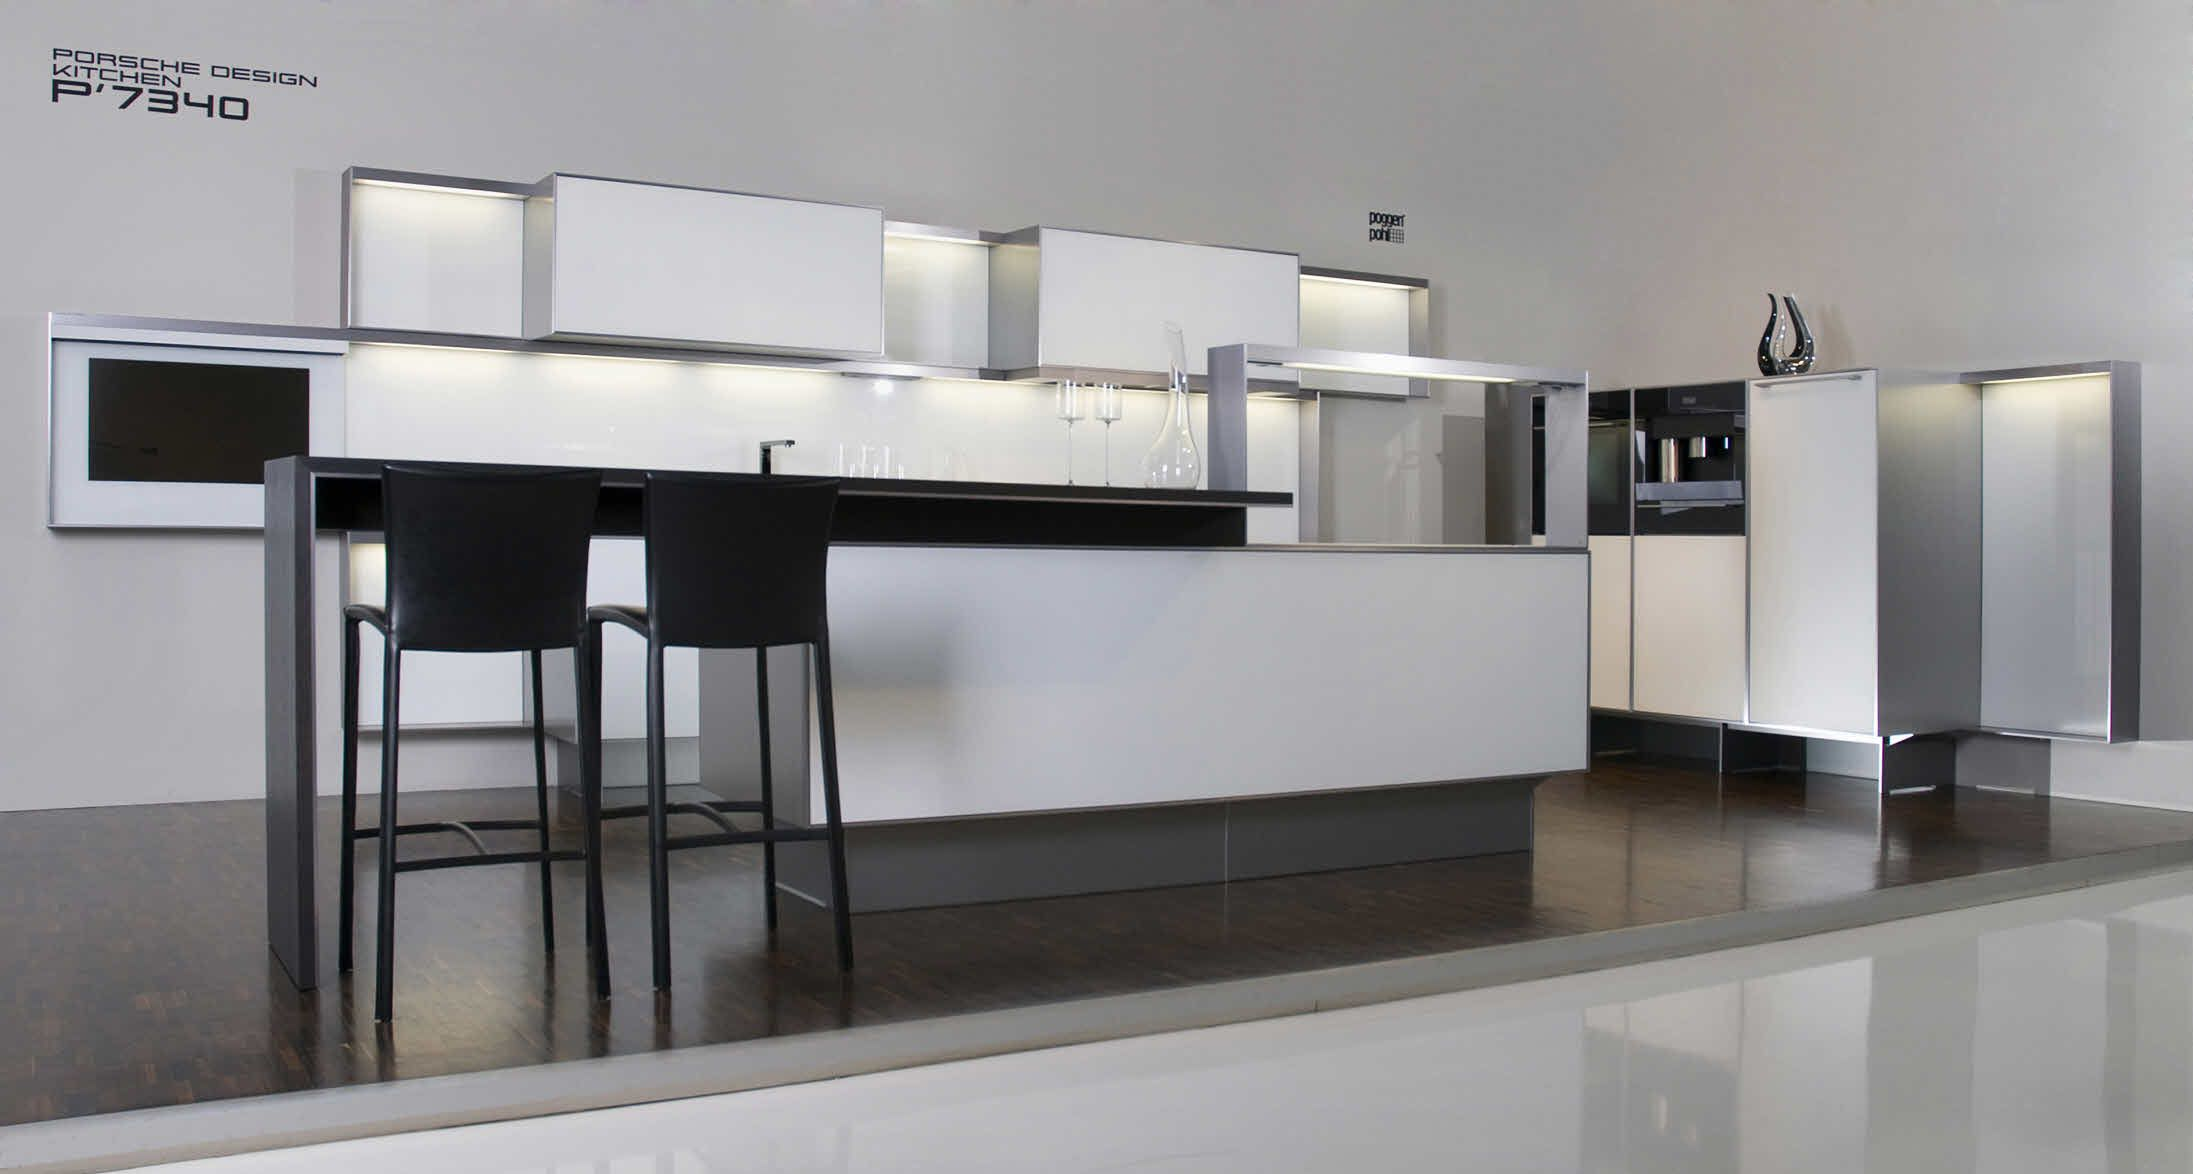 Porsche Design Küche Preis | Poggenpohl Porsche Design Kitchen P7340 Porsche Home Pinterest